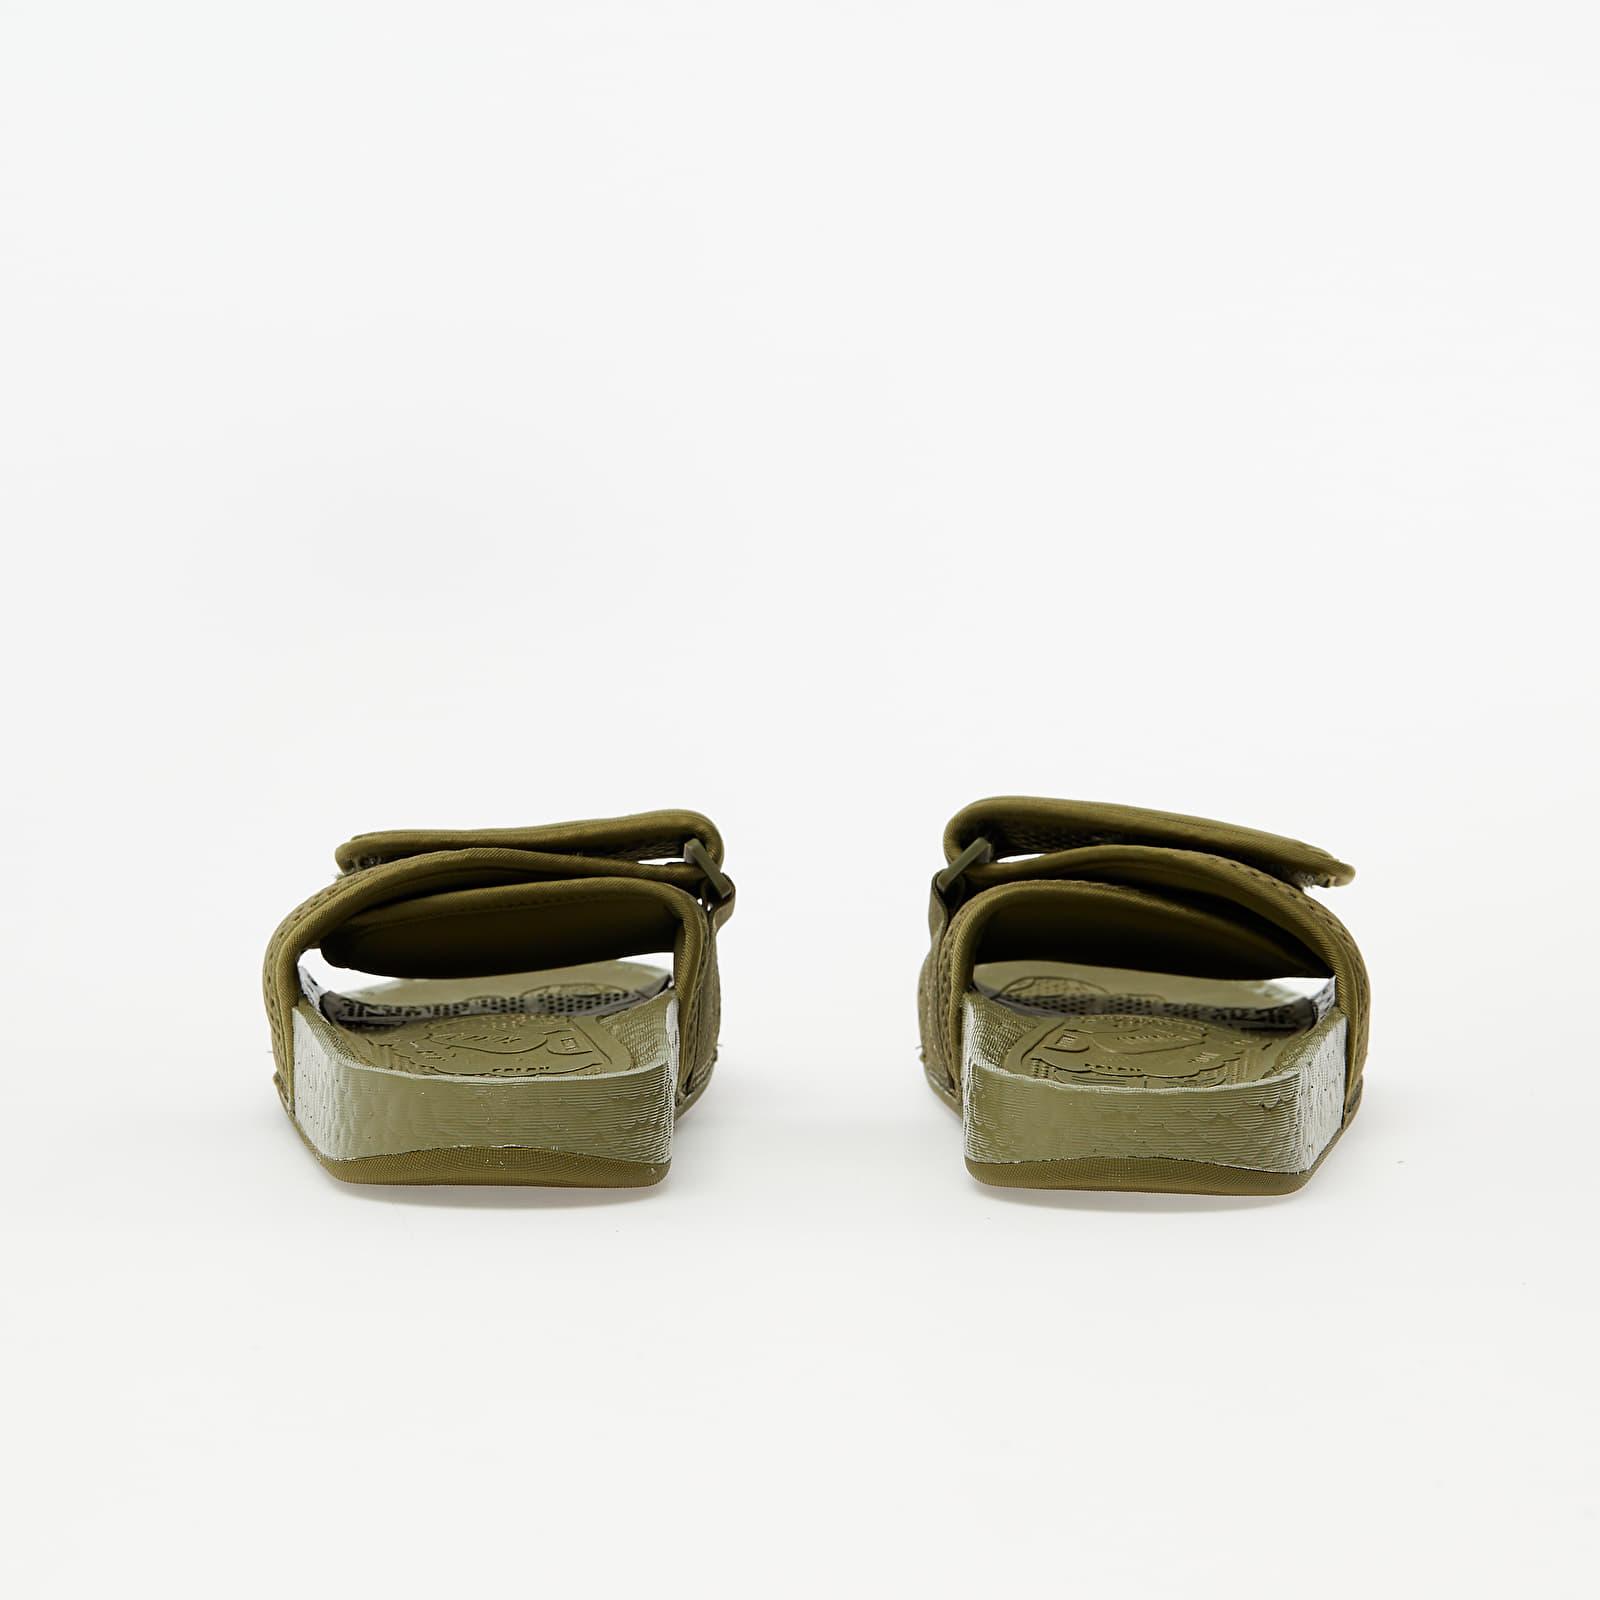 adidas x Pharrell Williams Chancletas Hu Olive Cargo/ Olive Cargo/ Olive Cargo, Green